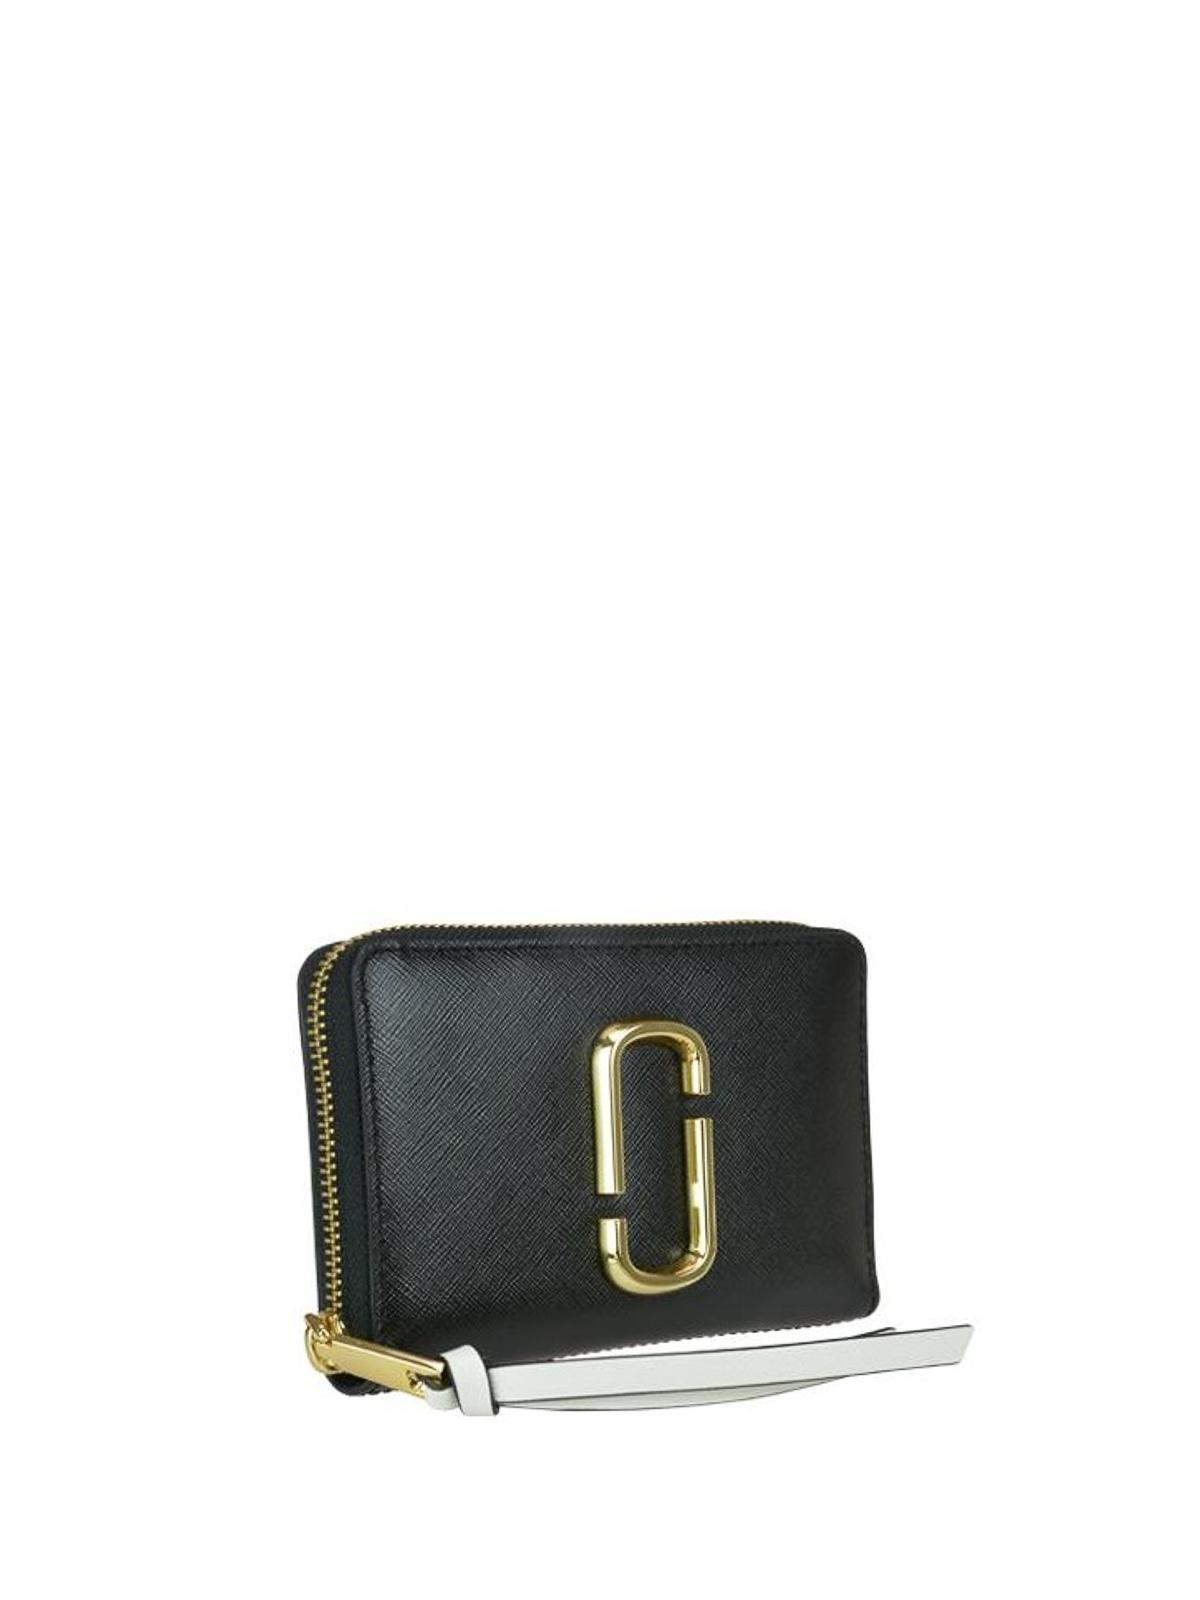 3c6d1c5b12 MARC JACOBS: wallets & purses online - Snapshot black and pink wallet